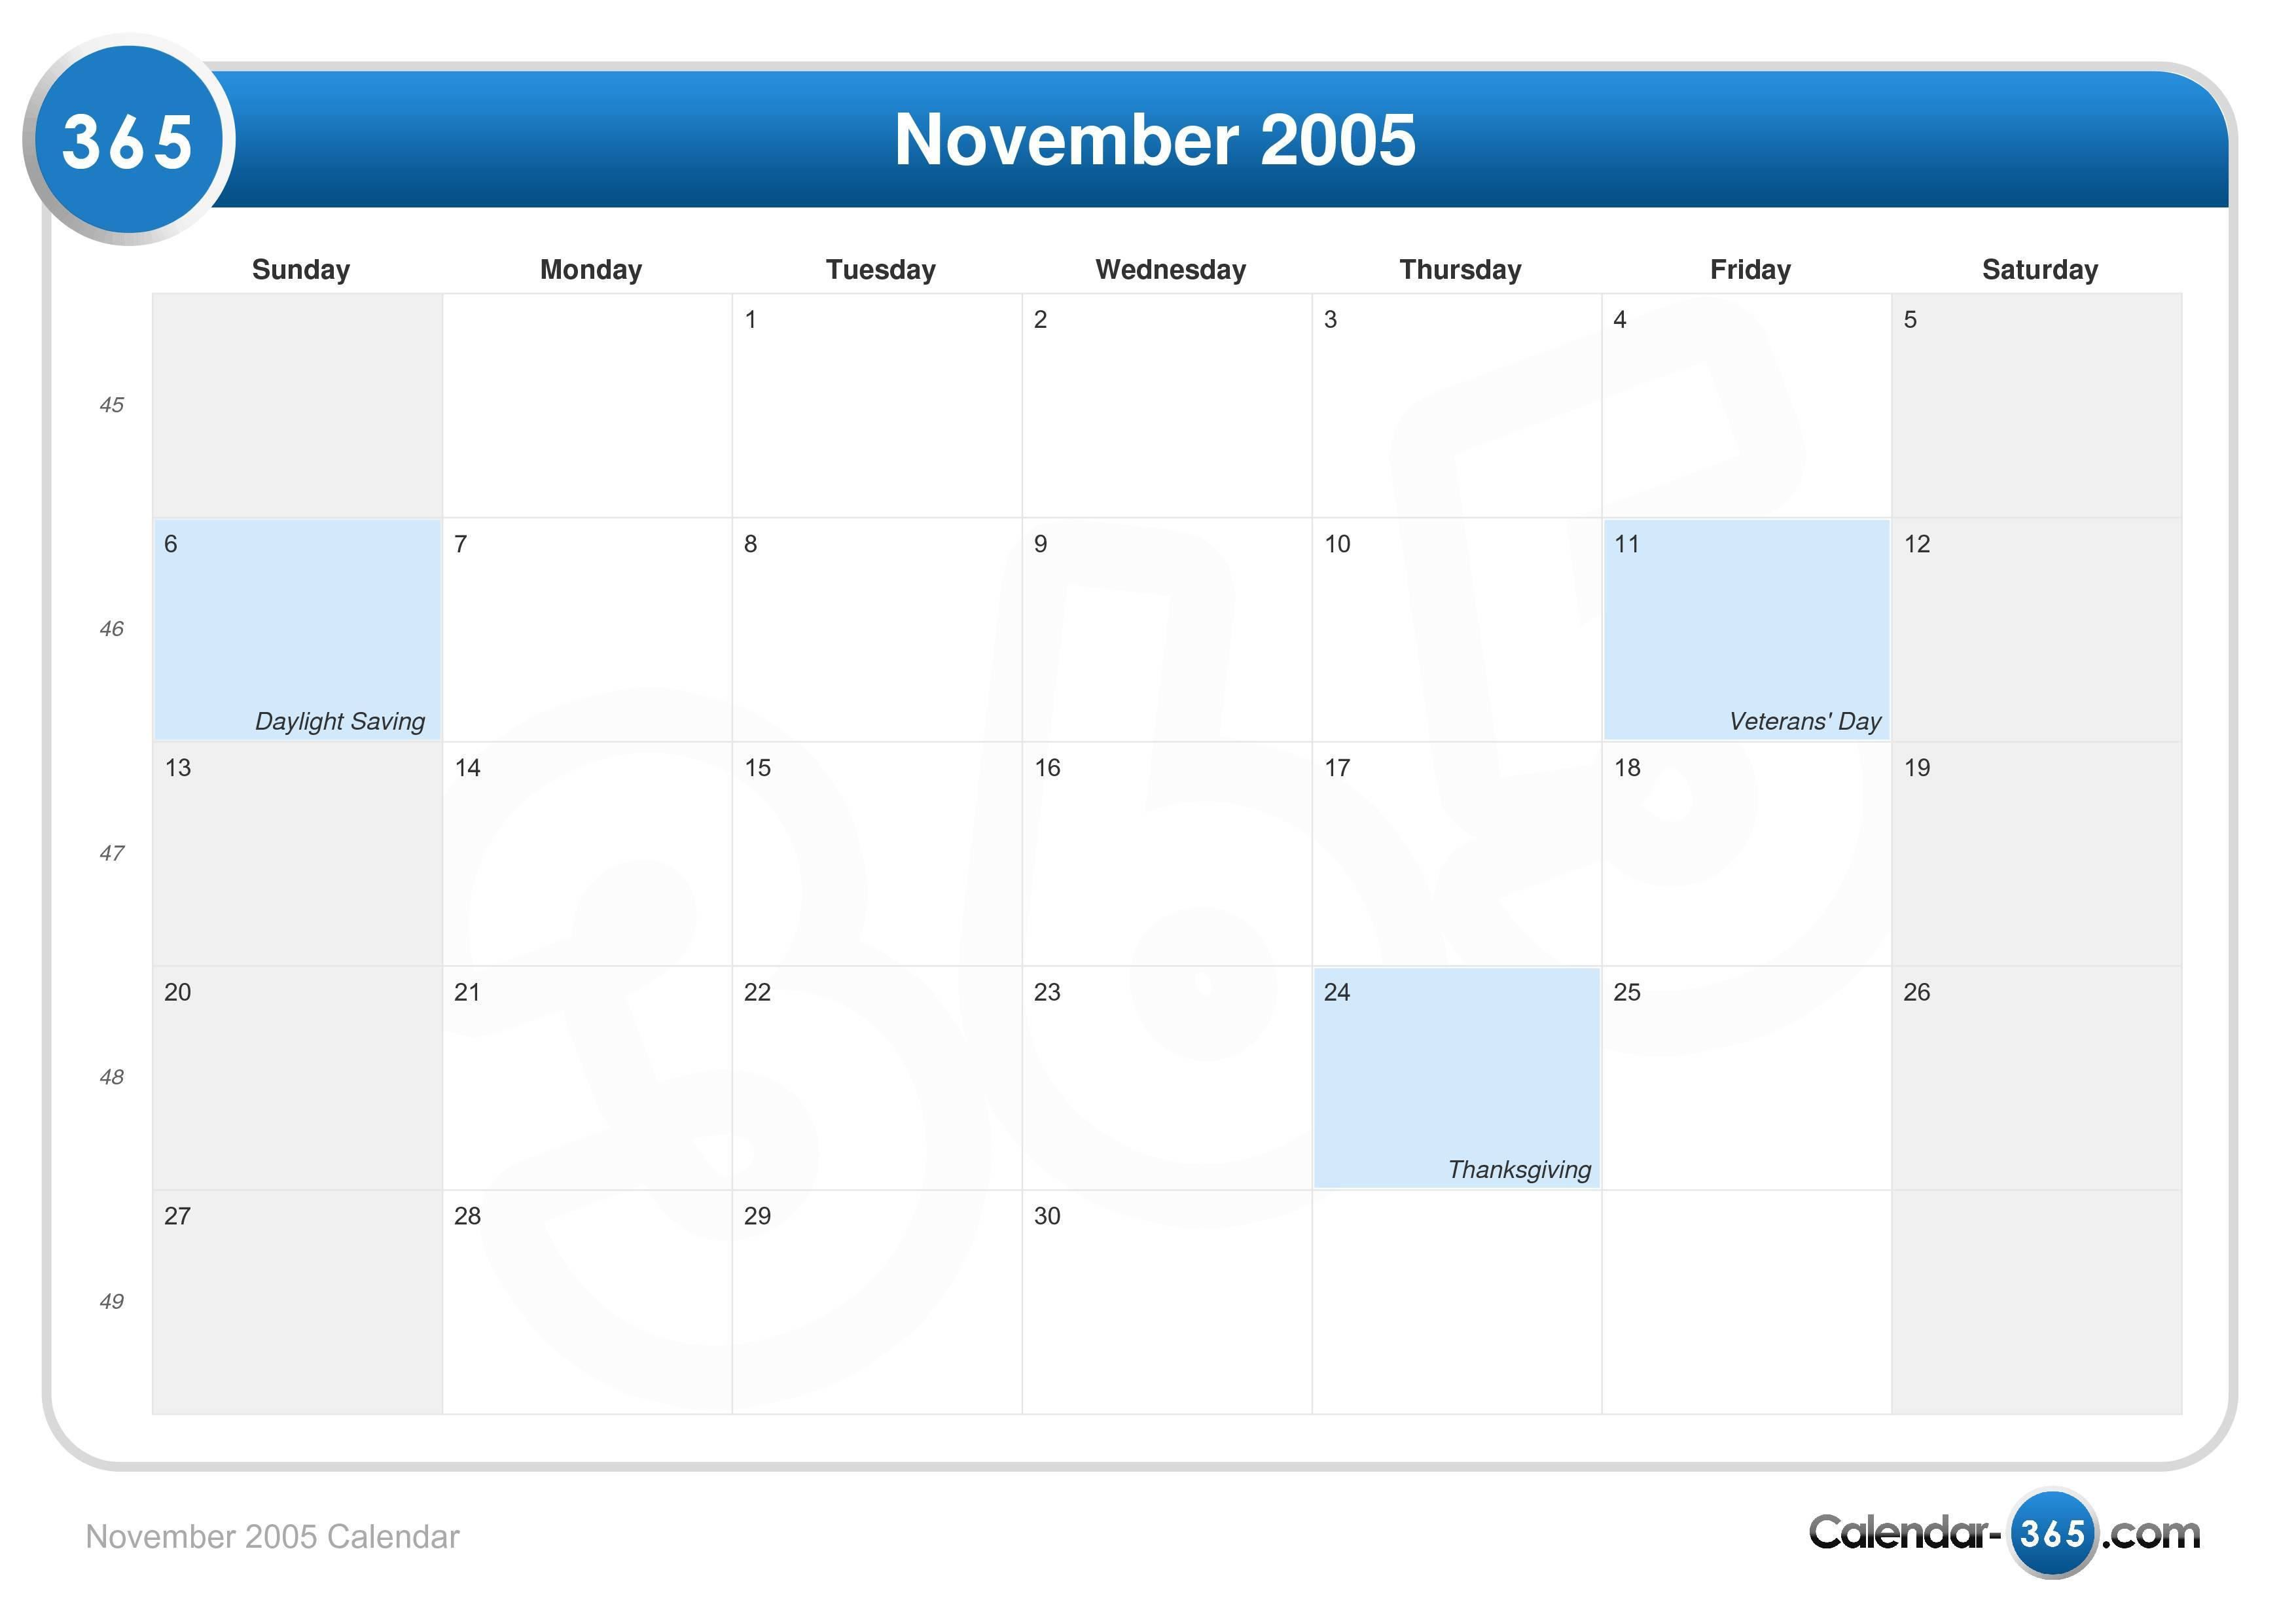 November 2005 Calendar